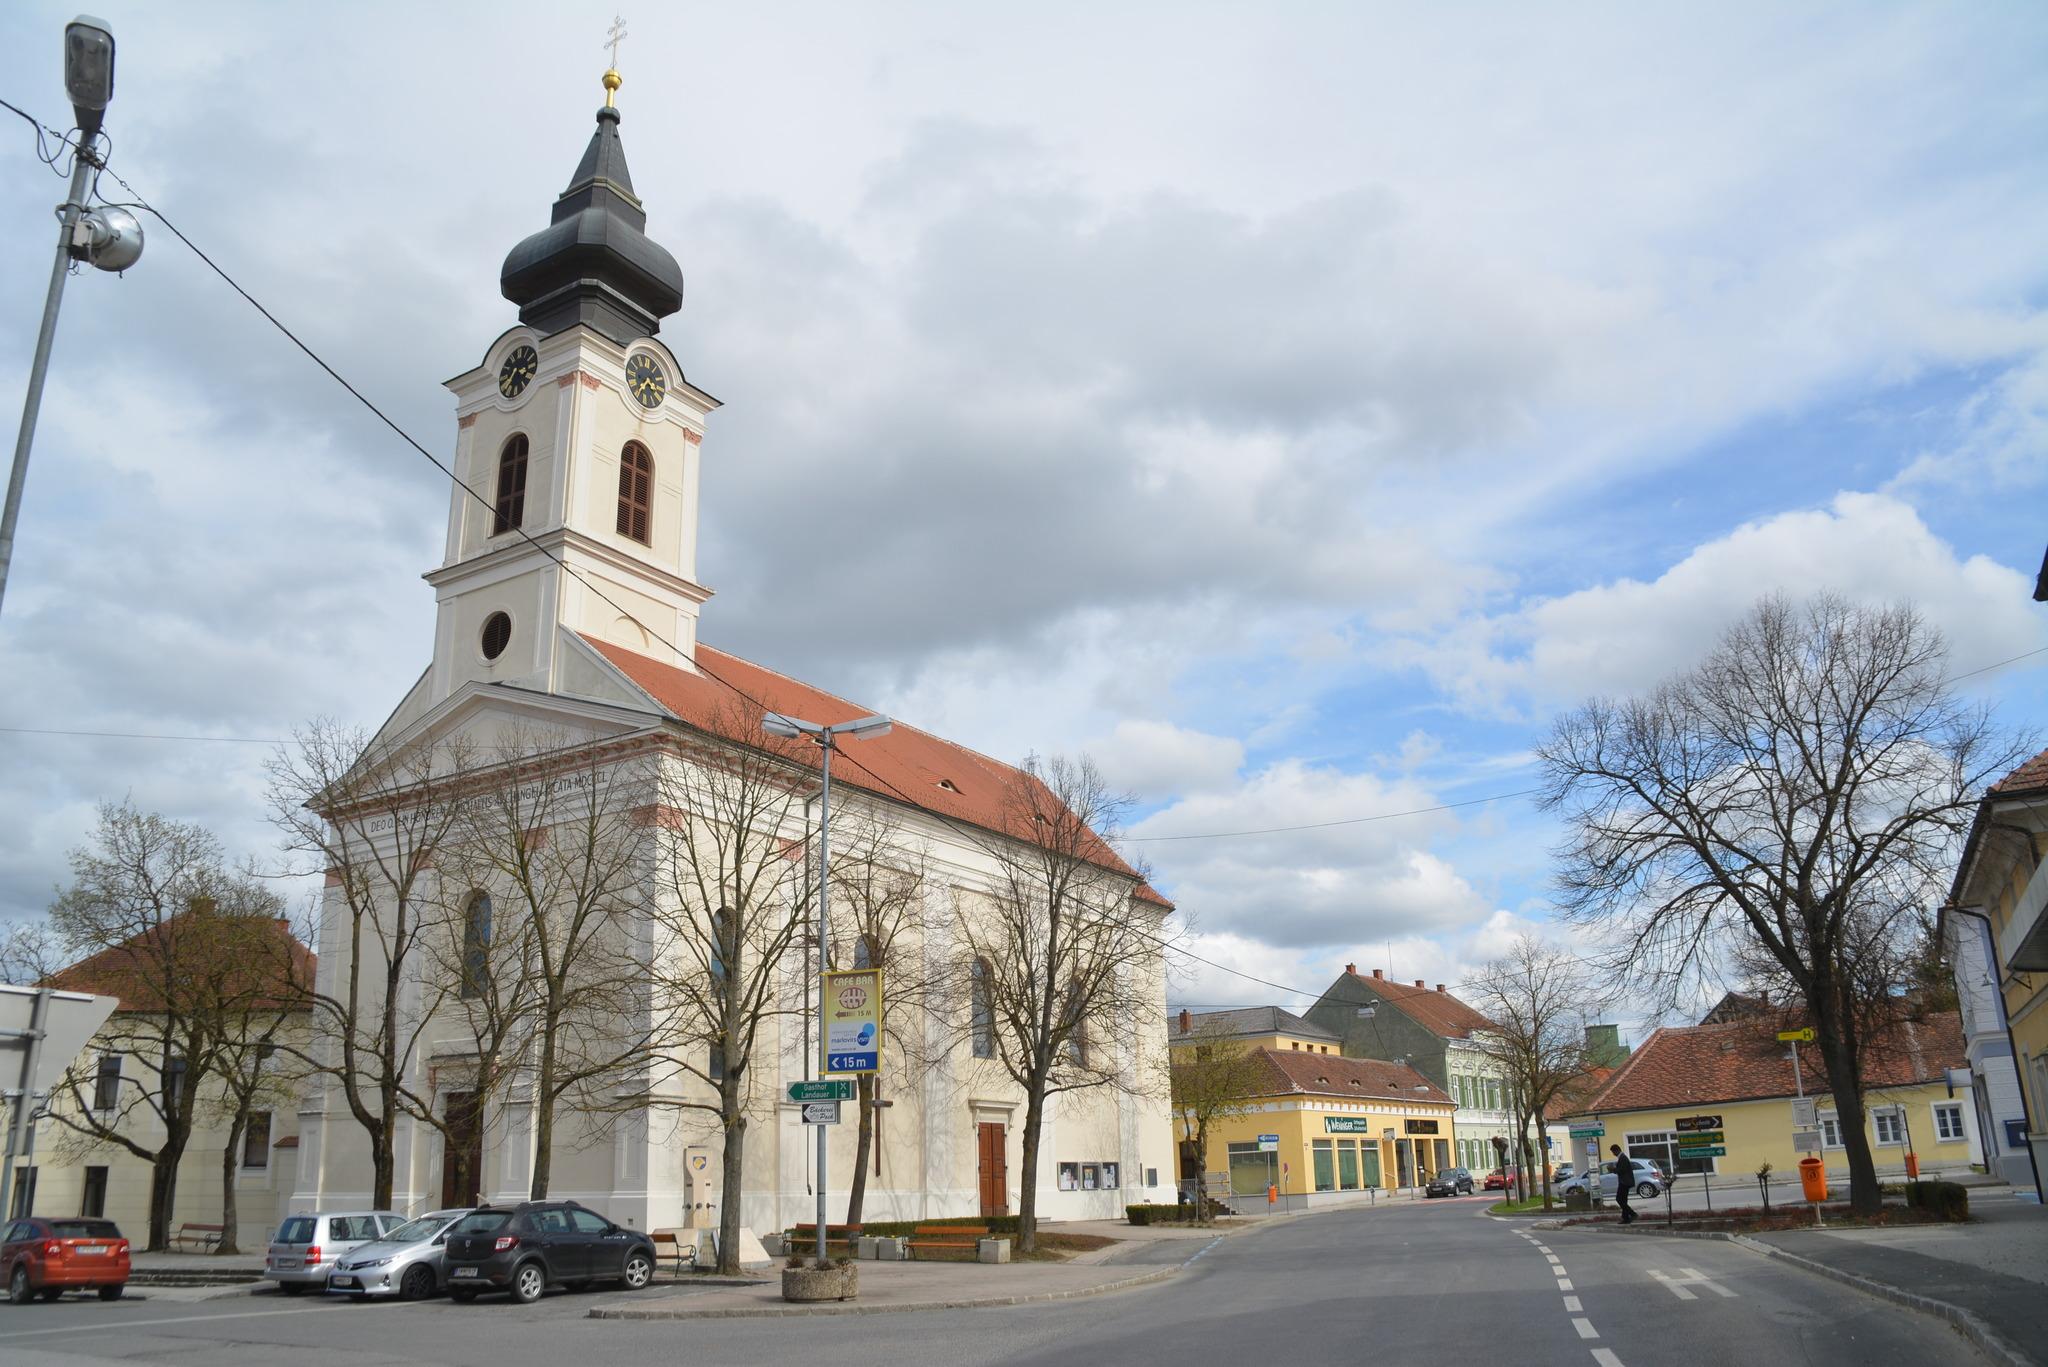 Stadt partnersuche aus gropetersdorf Waizenkirchen frau sucht mann